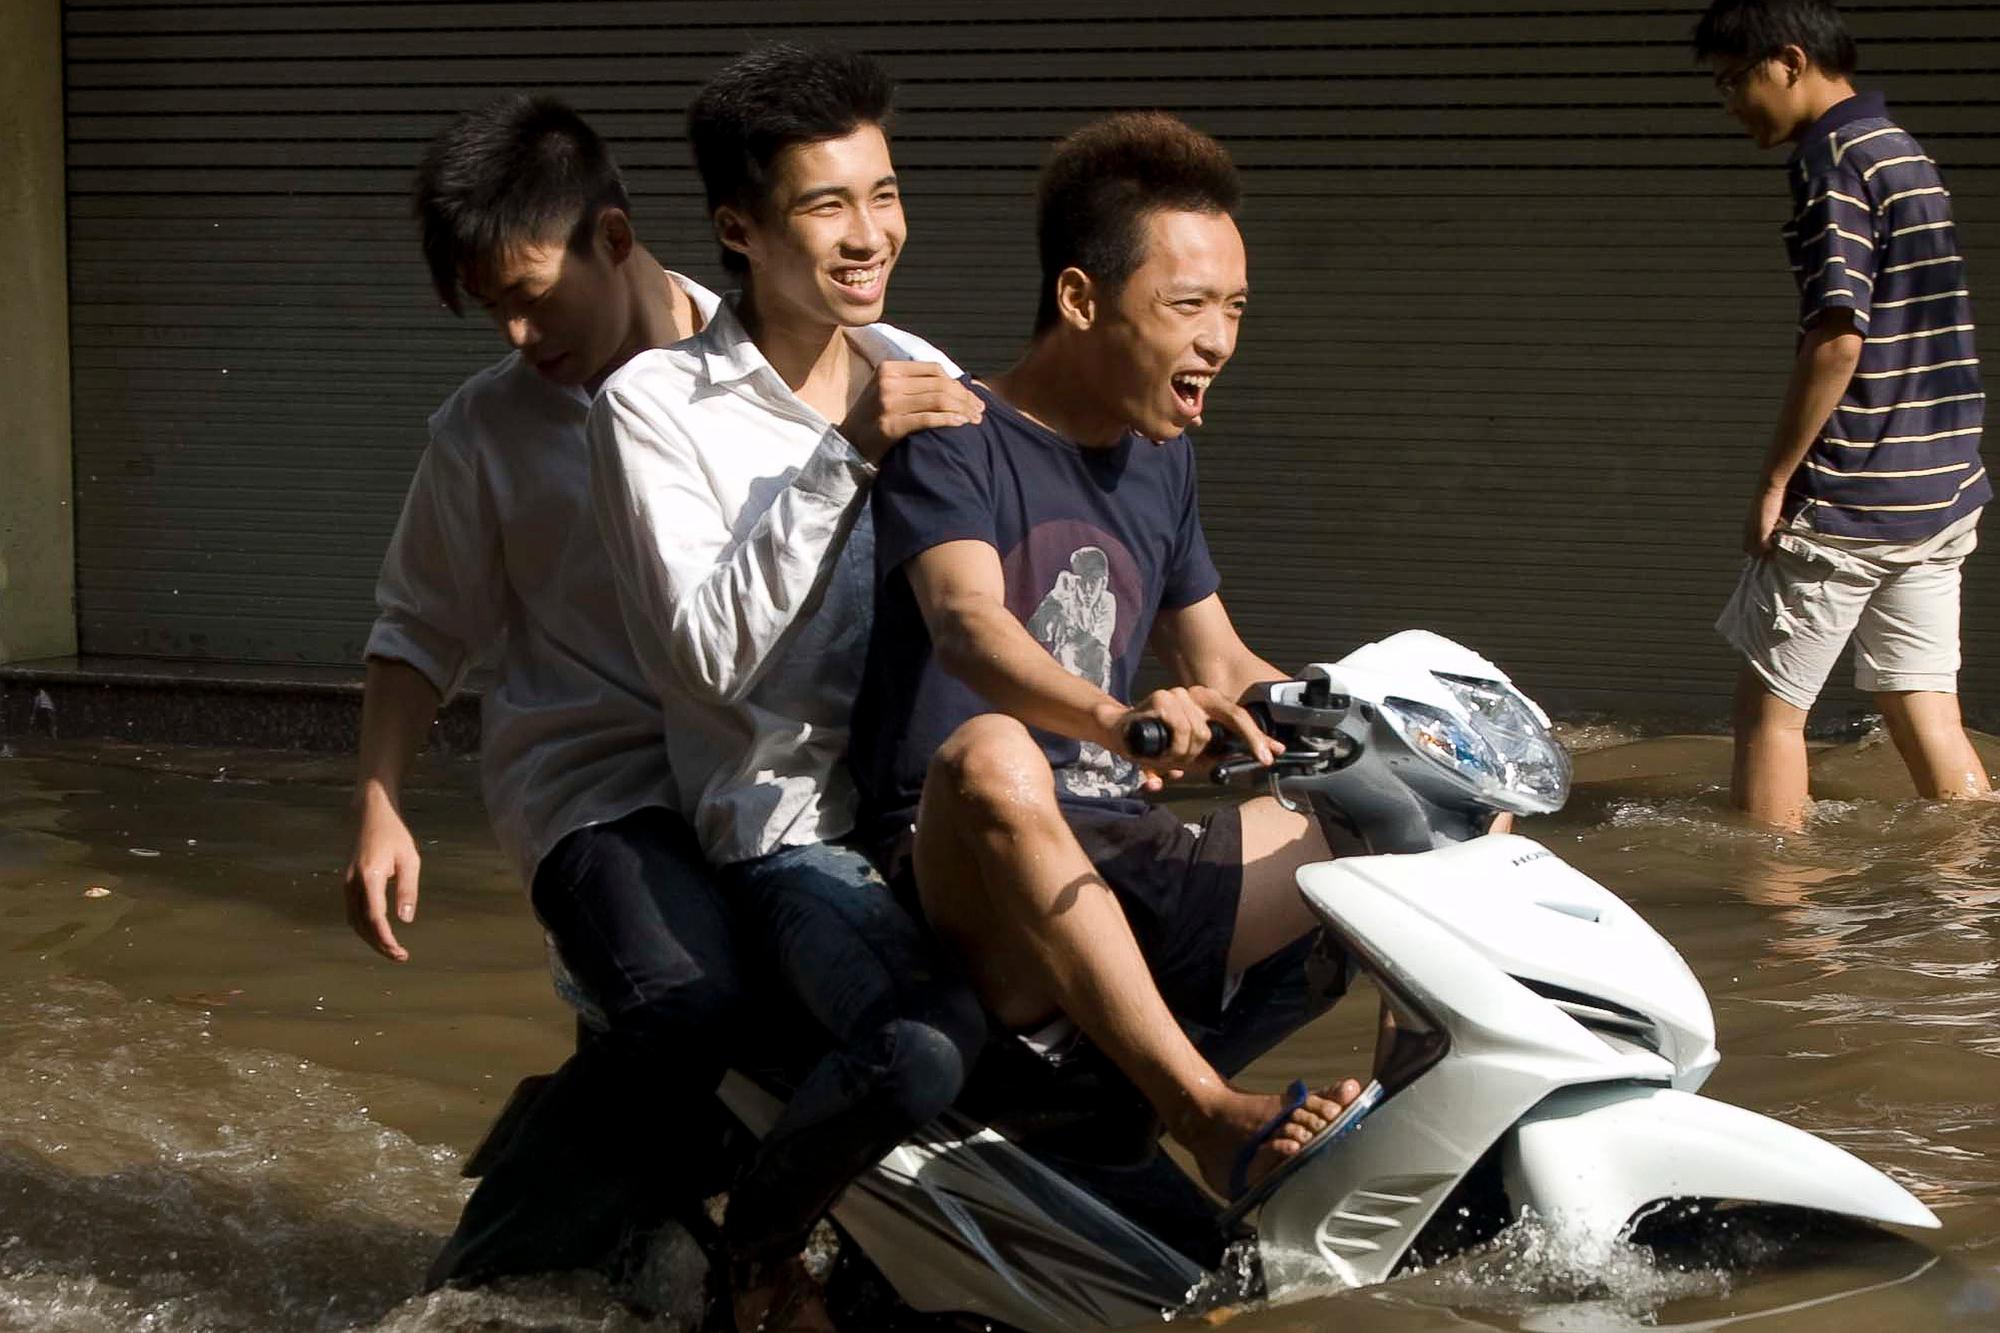 vietnam_haoi_flood_motorbike_fun.jpg